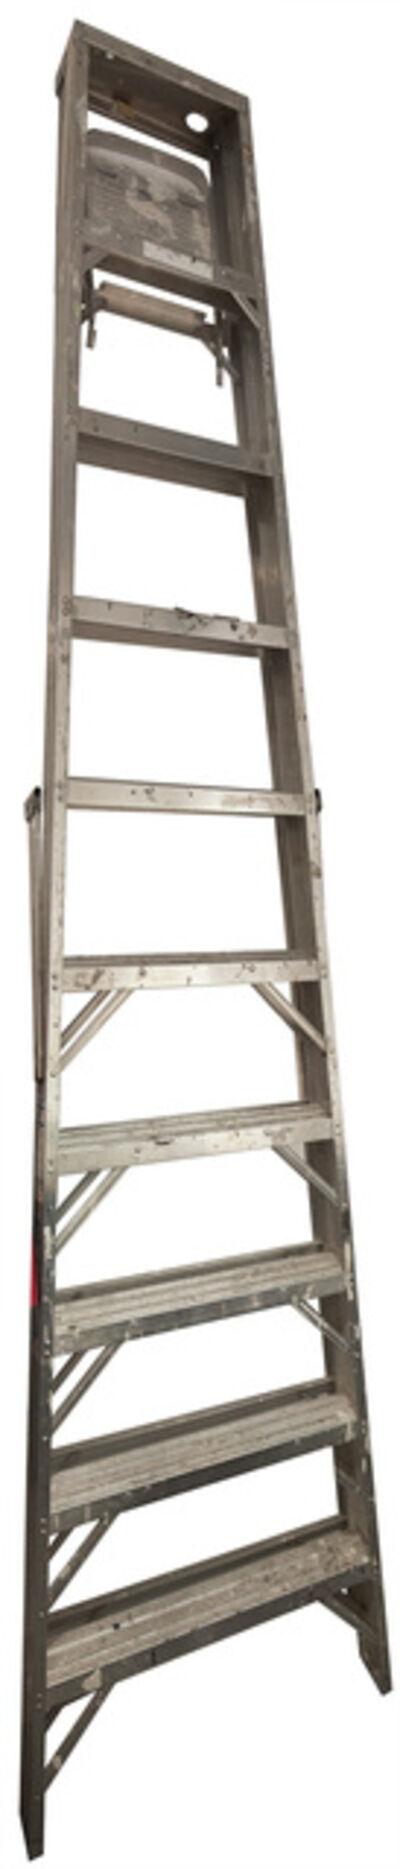 Jennifer Williams, 'Large Folding Ladder: Aluminum #1', 2009